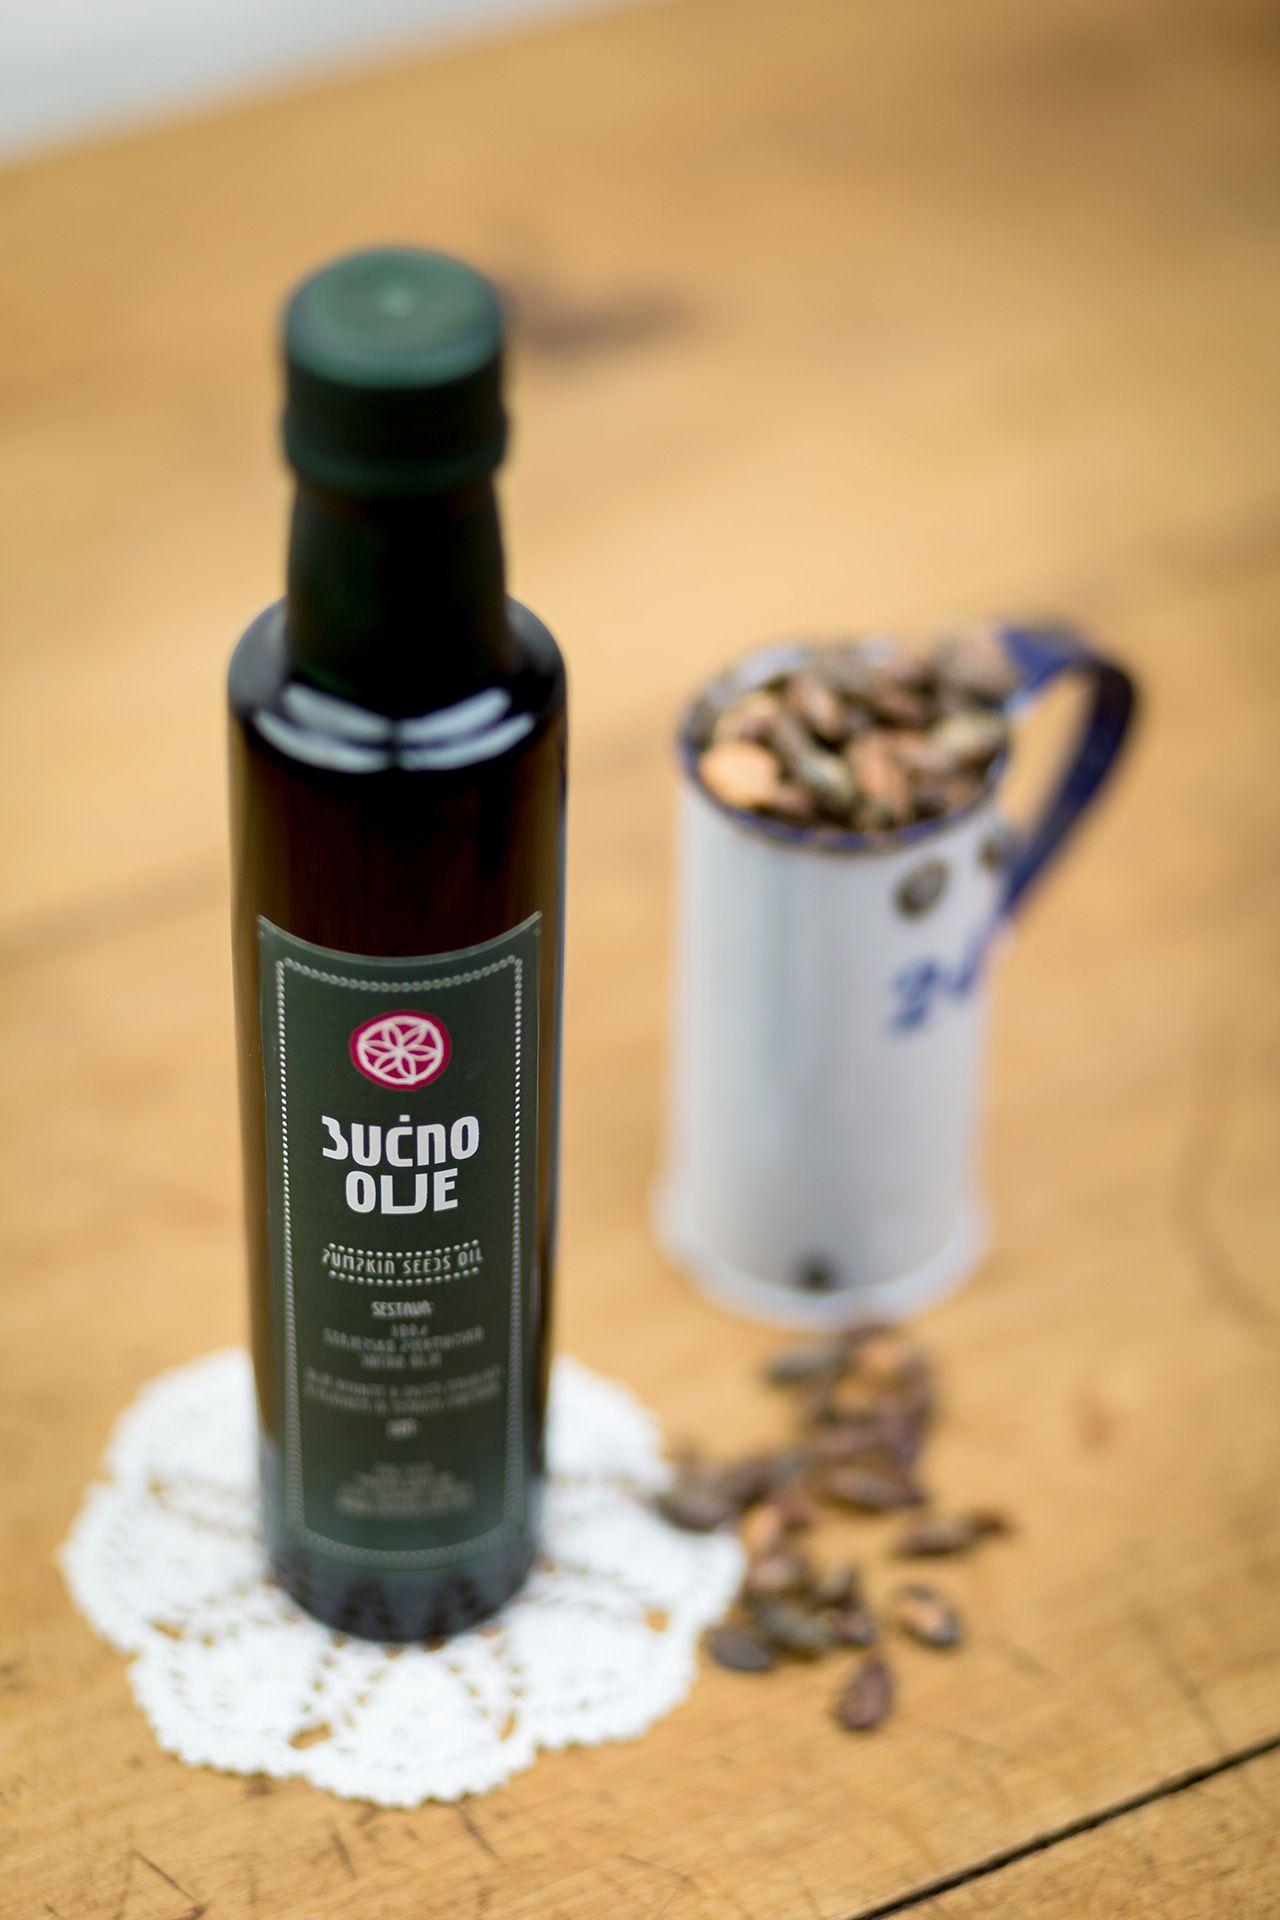 Pumpkin Seeds And Oil Homestead Workwithheart Homemade Gorapodlipo Lipo Coffee Bottle Starbucks Iced Coffee Bottle